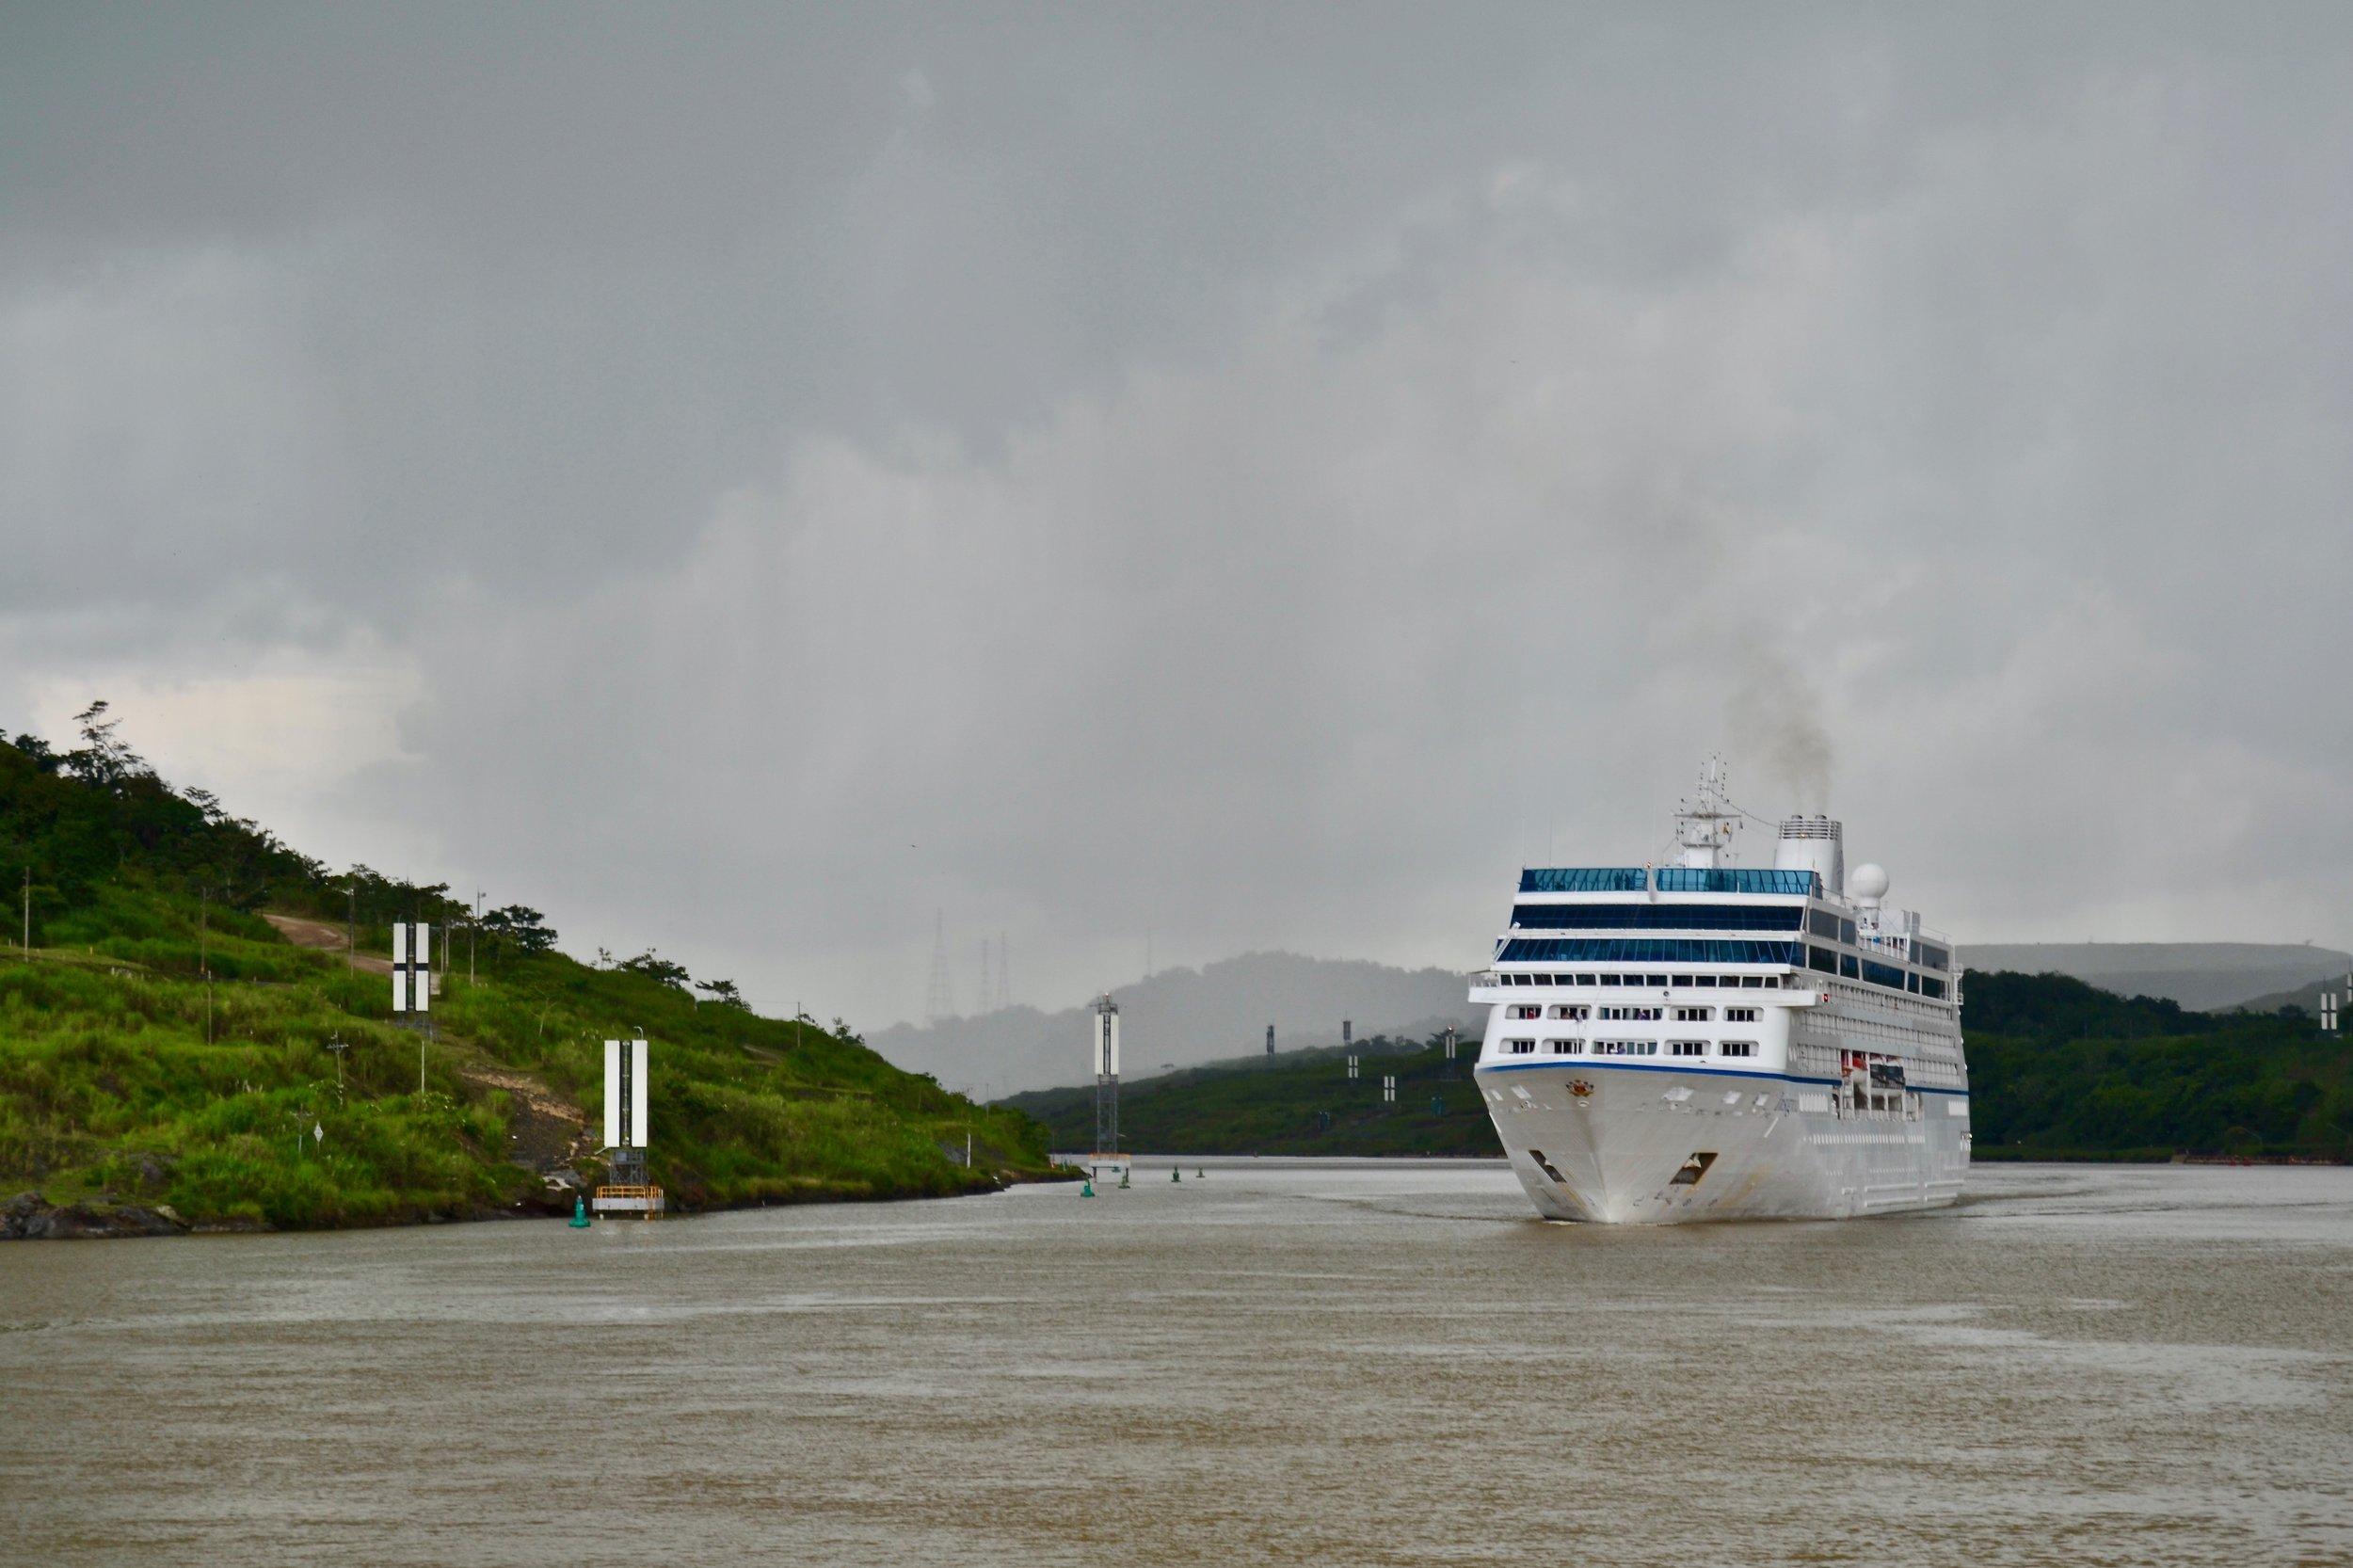 Cruise Ship on the Panama Canal